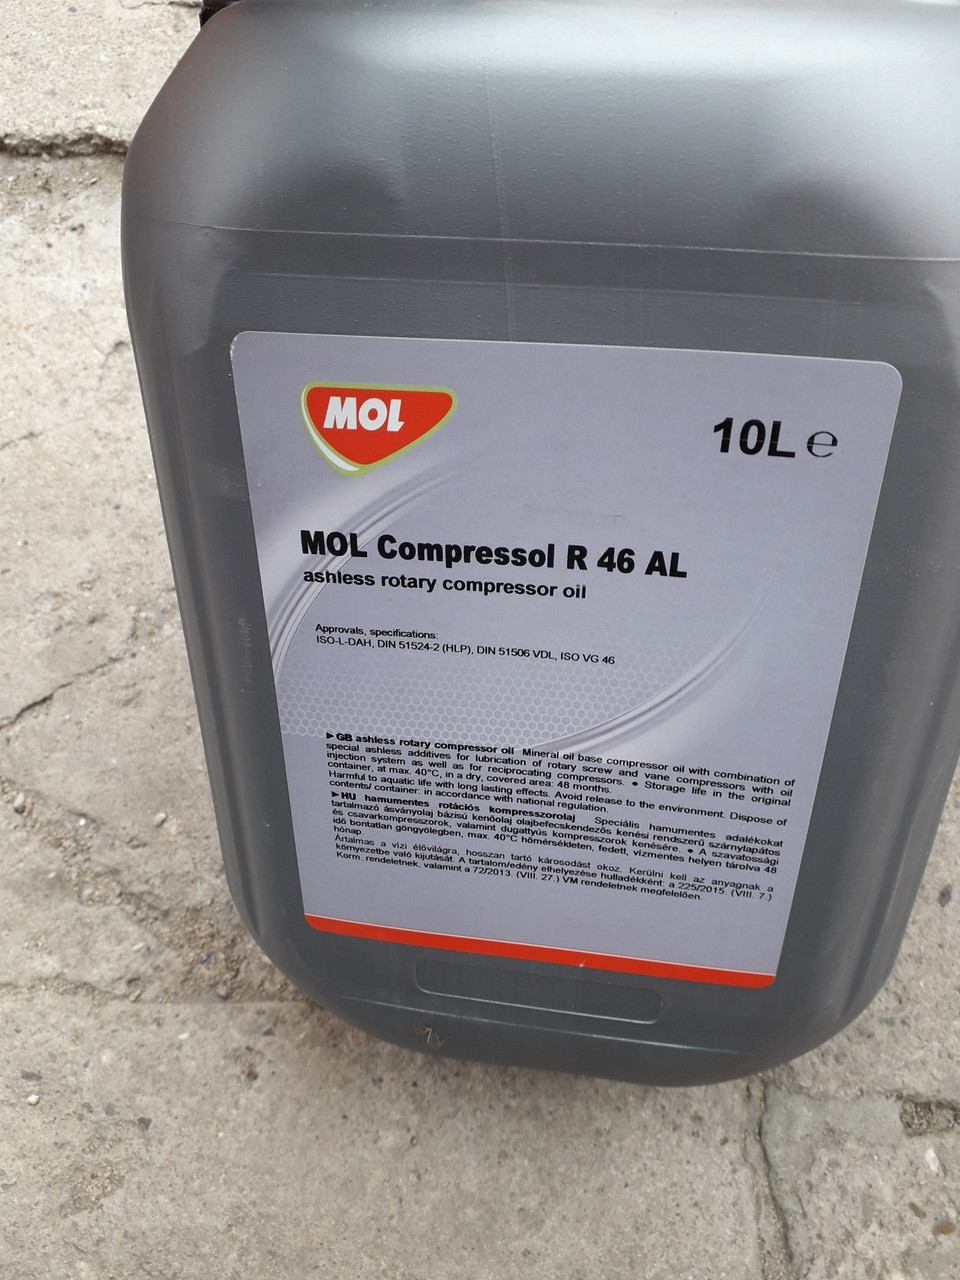 MOL Compressol R 46 AL Компрессорное масло